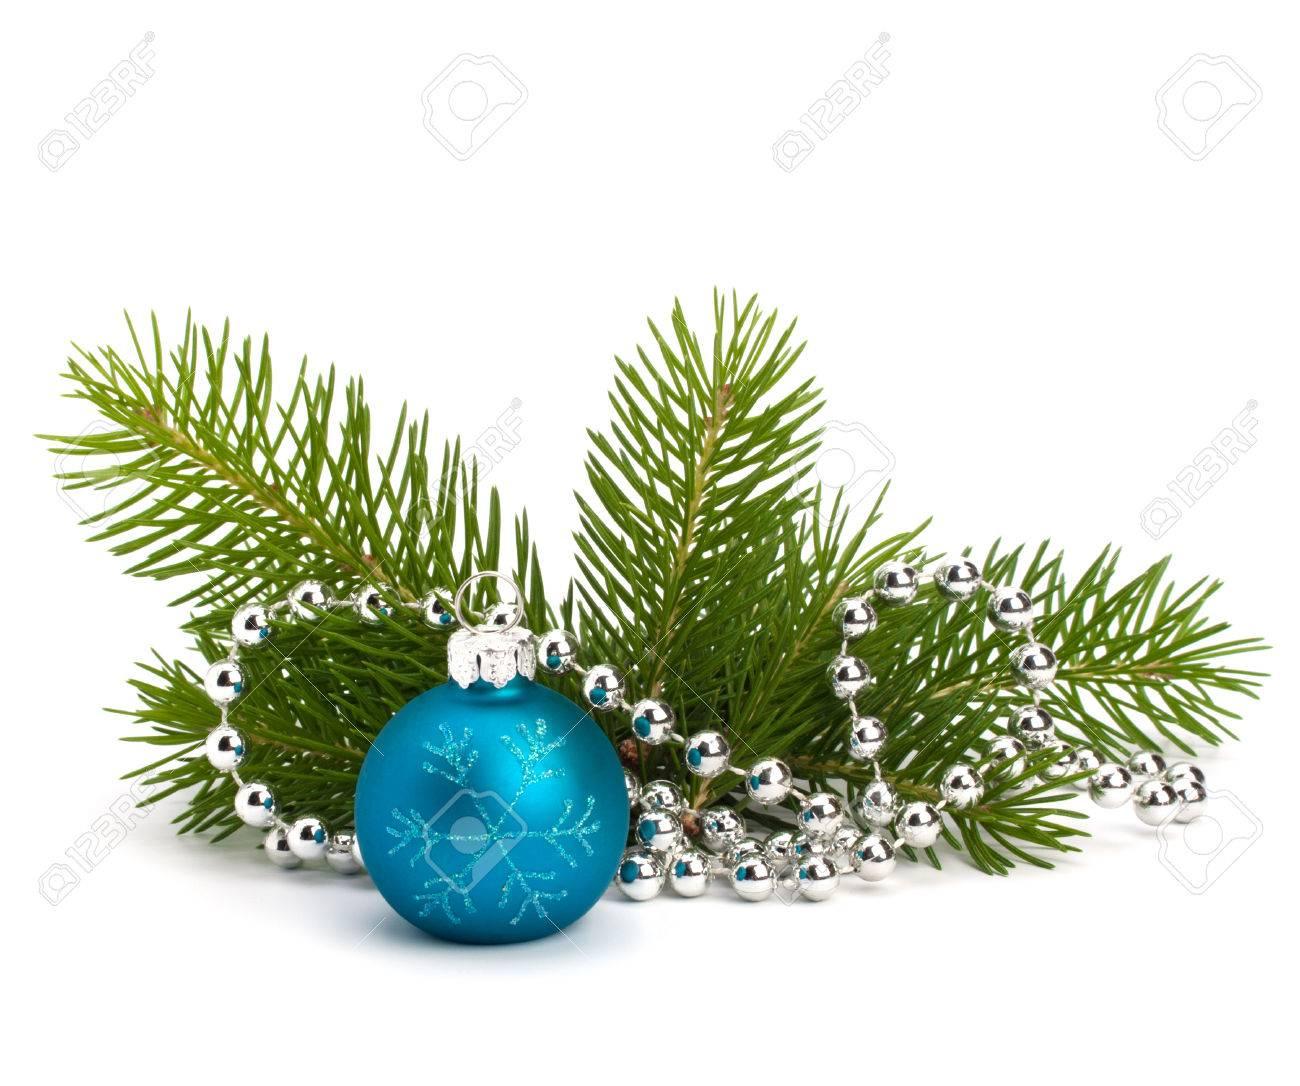 Christmas ball decoration isolated on white background - 33399565